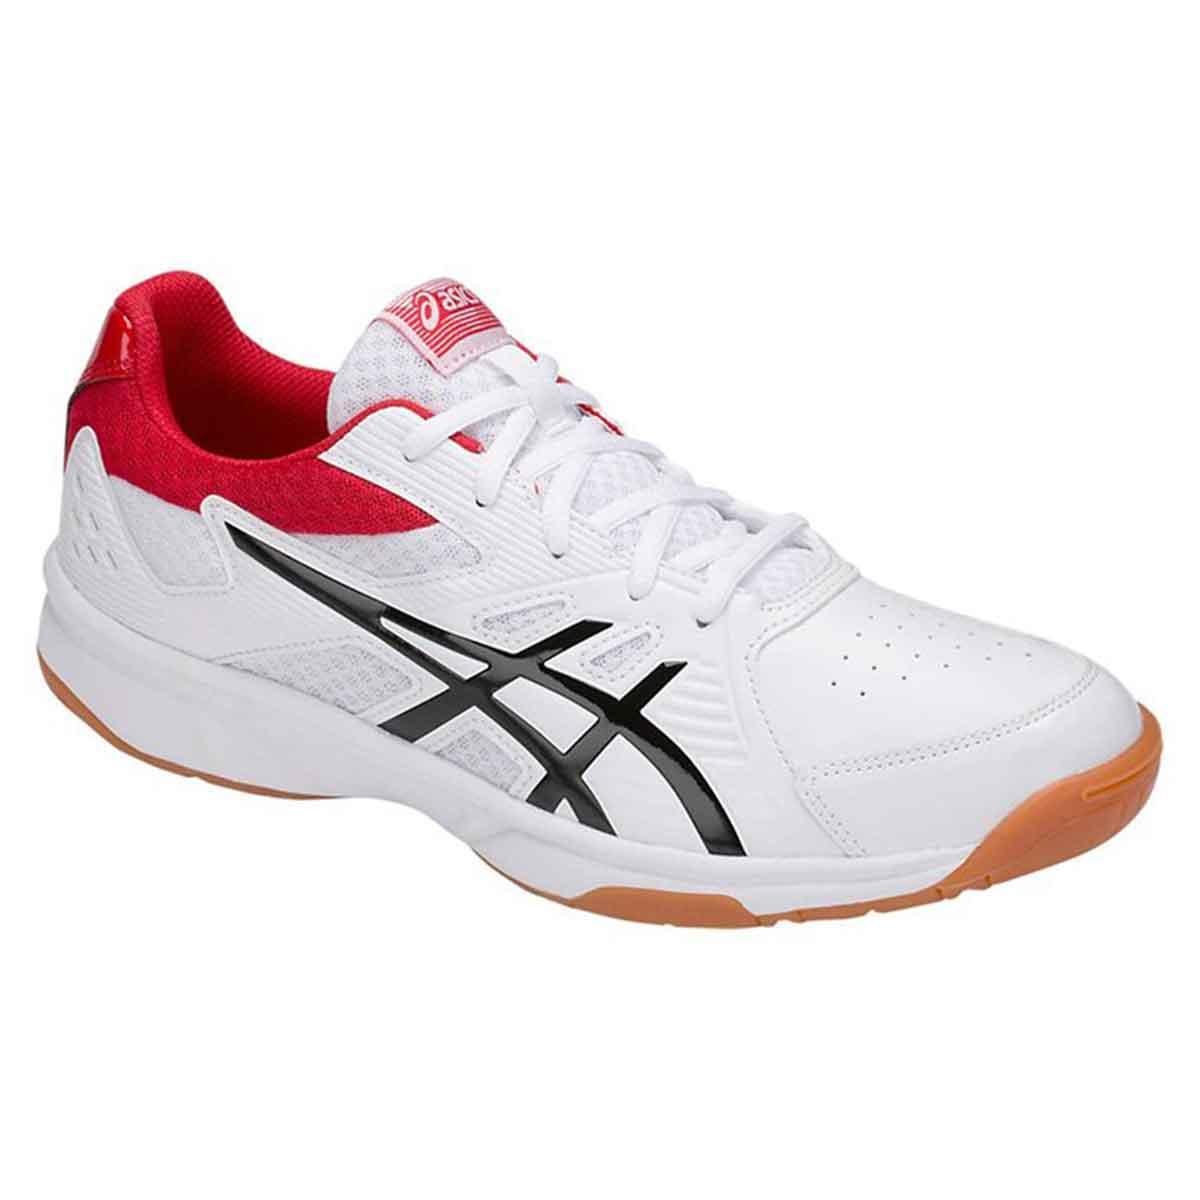 Asics Court Break Indoor Court Shoes (White/Black)